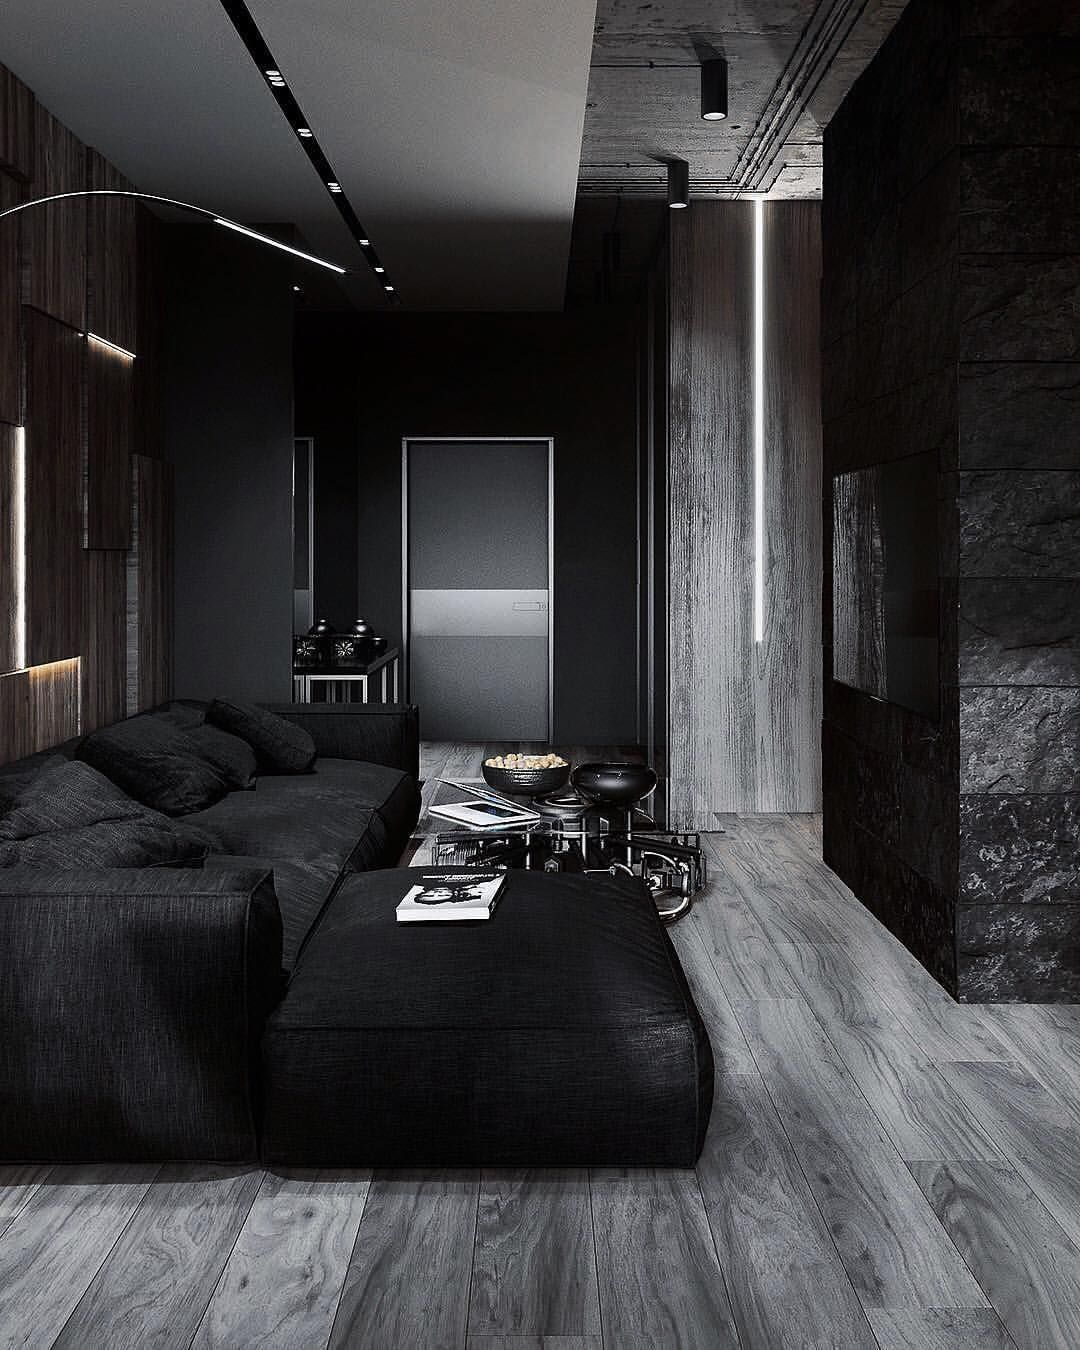 45 Cozy Bedroom Decoration Ideas images